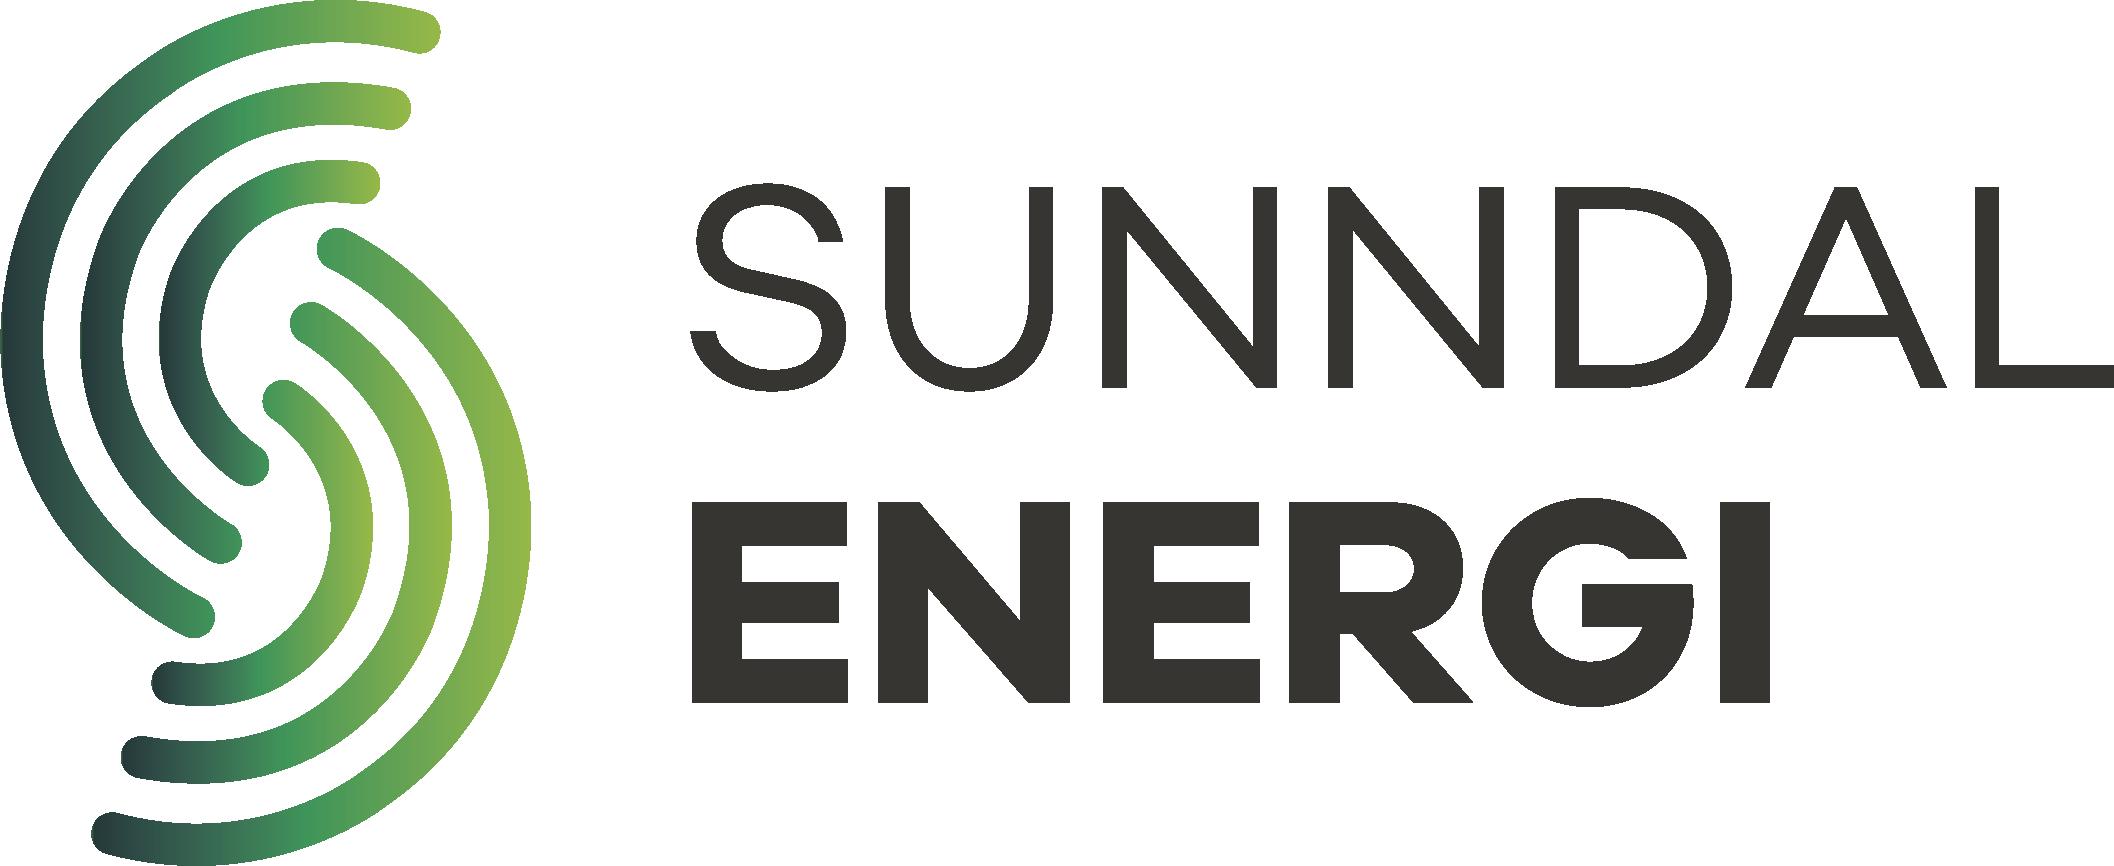 Sunndal Energi AS